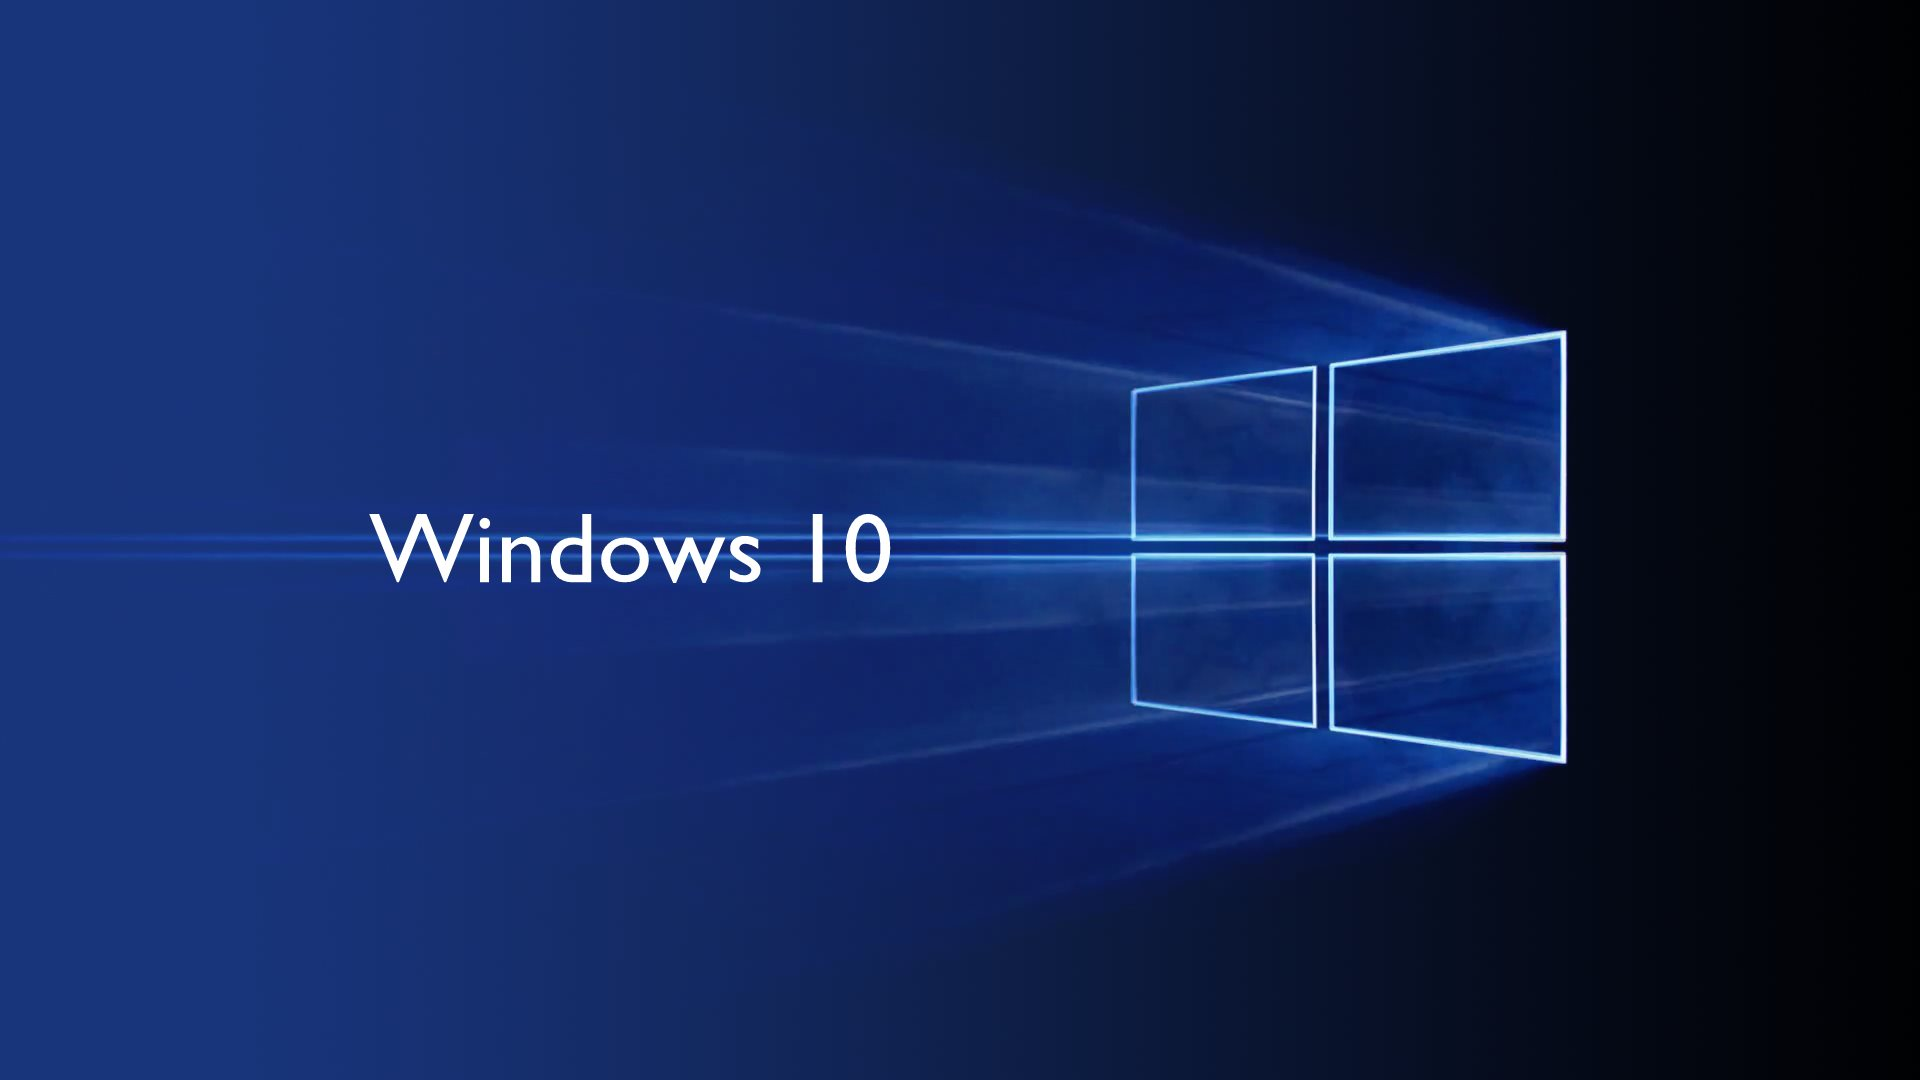 Windows 10 - hero